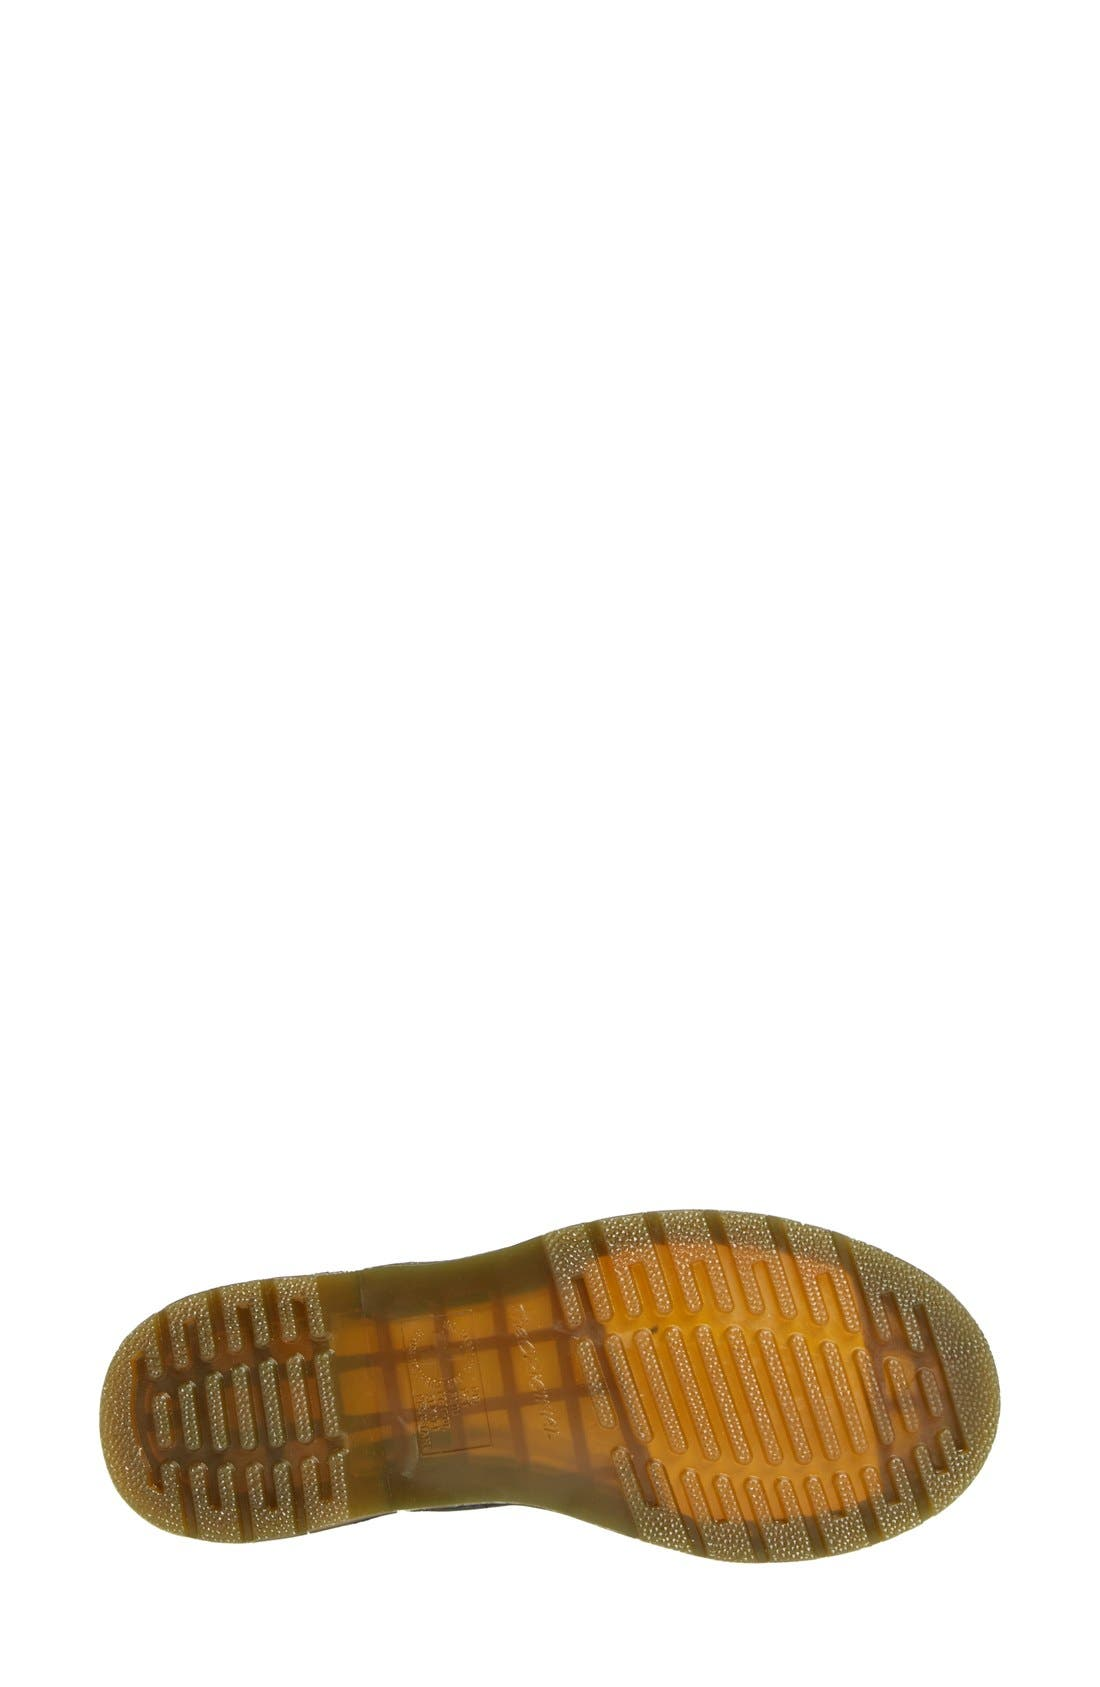 DR. MARTENS, '1B99' Leather Boot, Alternate thumbnail 4, color, BLACK VIRGINIA